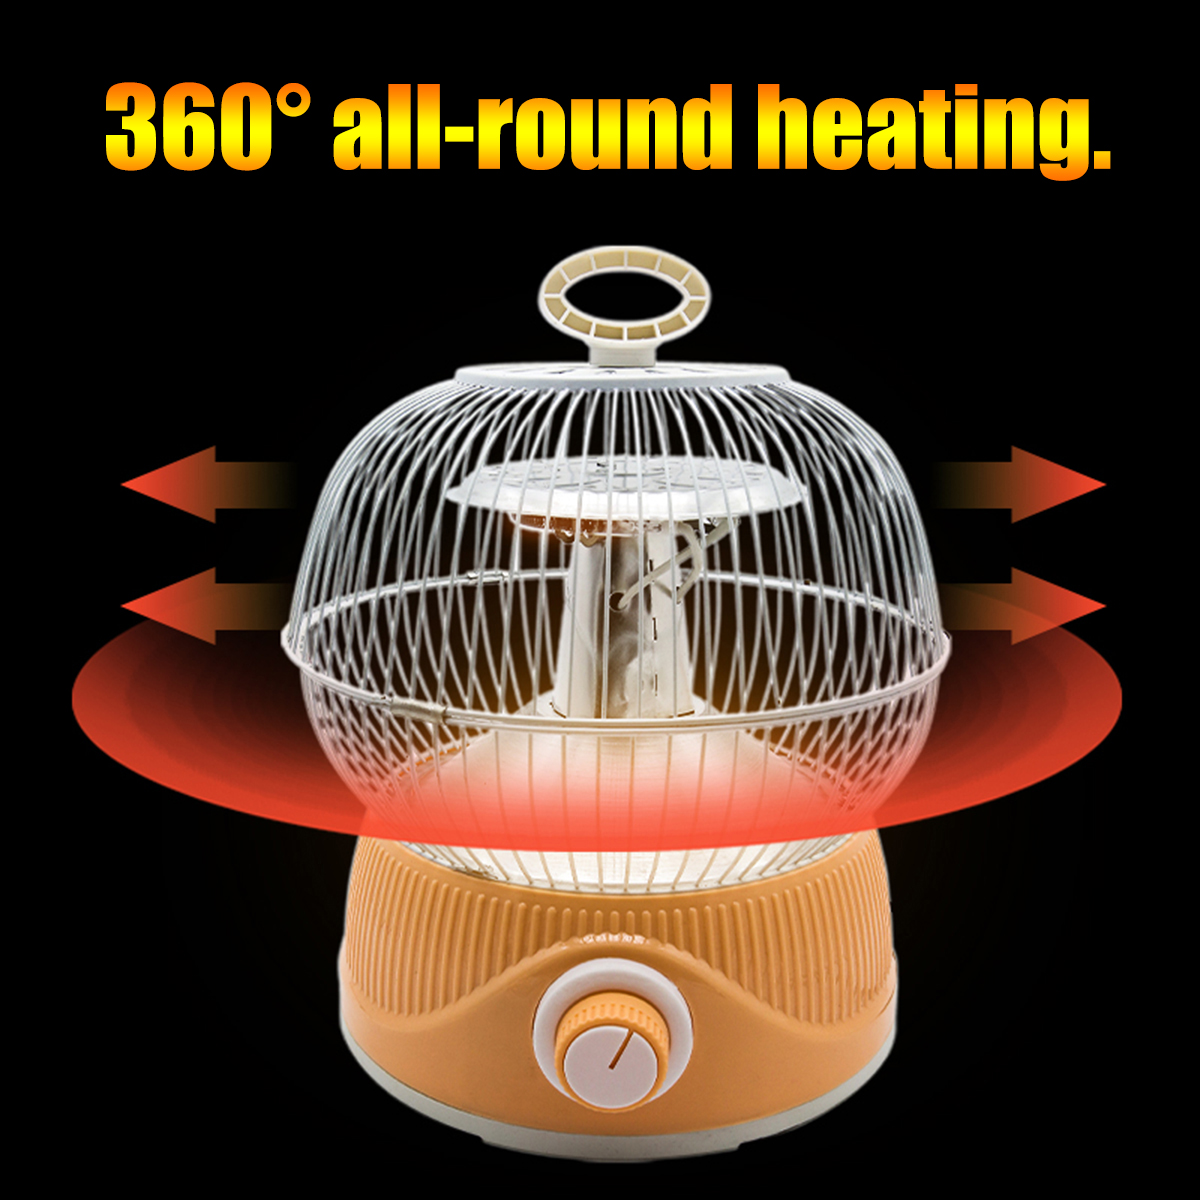 220V 900W Desktop Household Heater Electric Heater Stove Radiator Warmer Machine Heater Fan For Winter Bird Cage Safety Home все цены